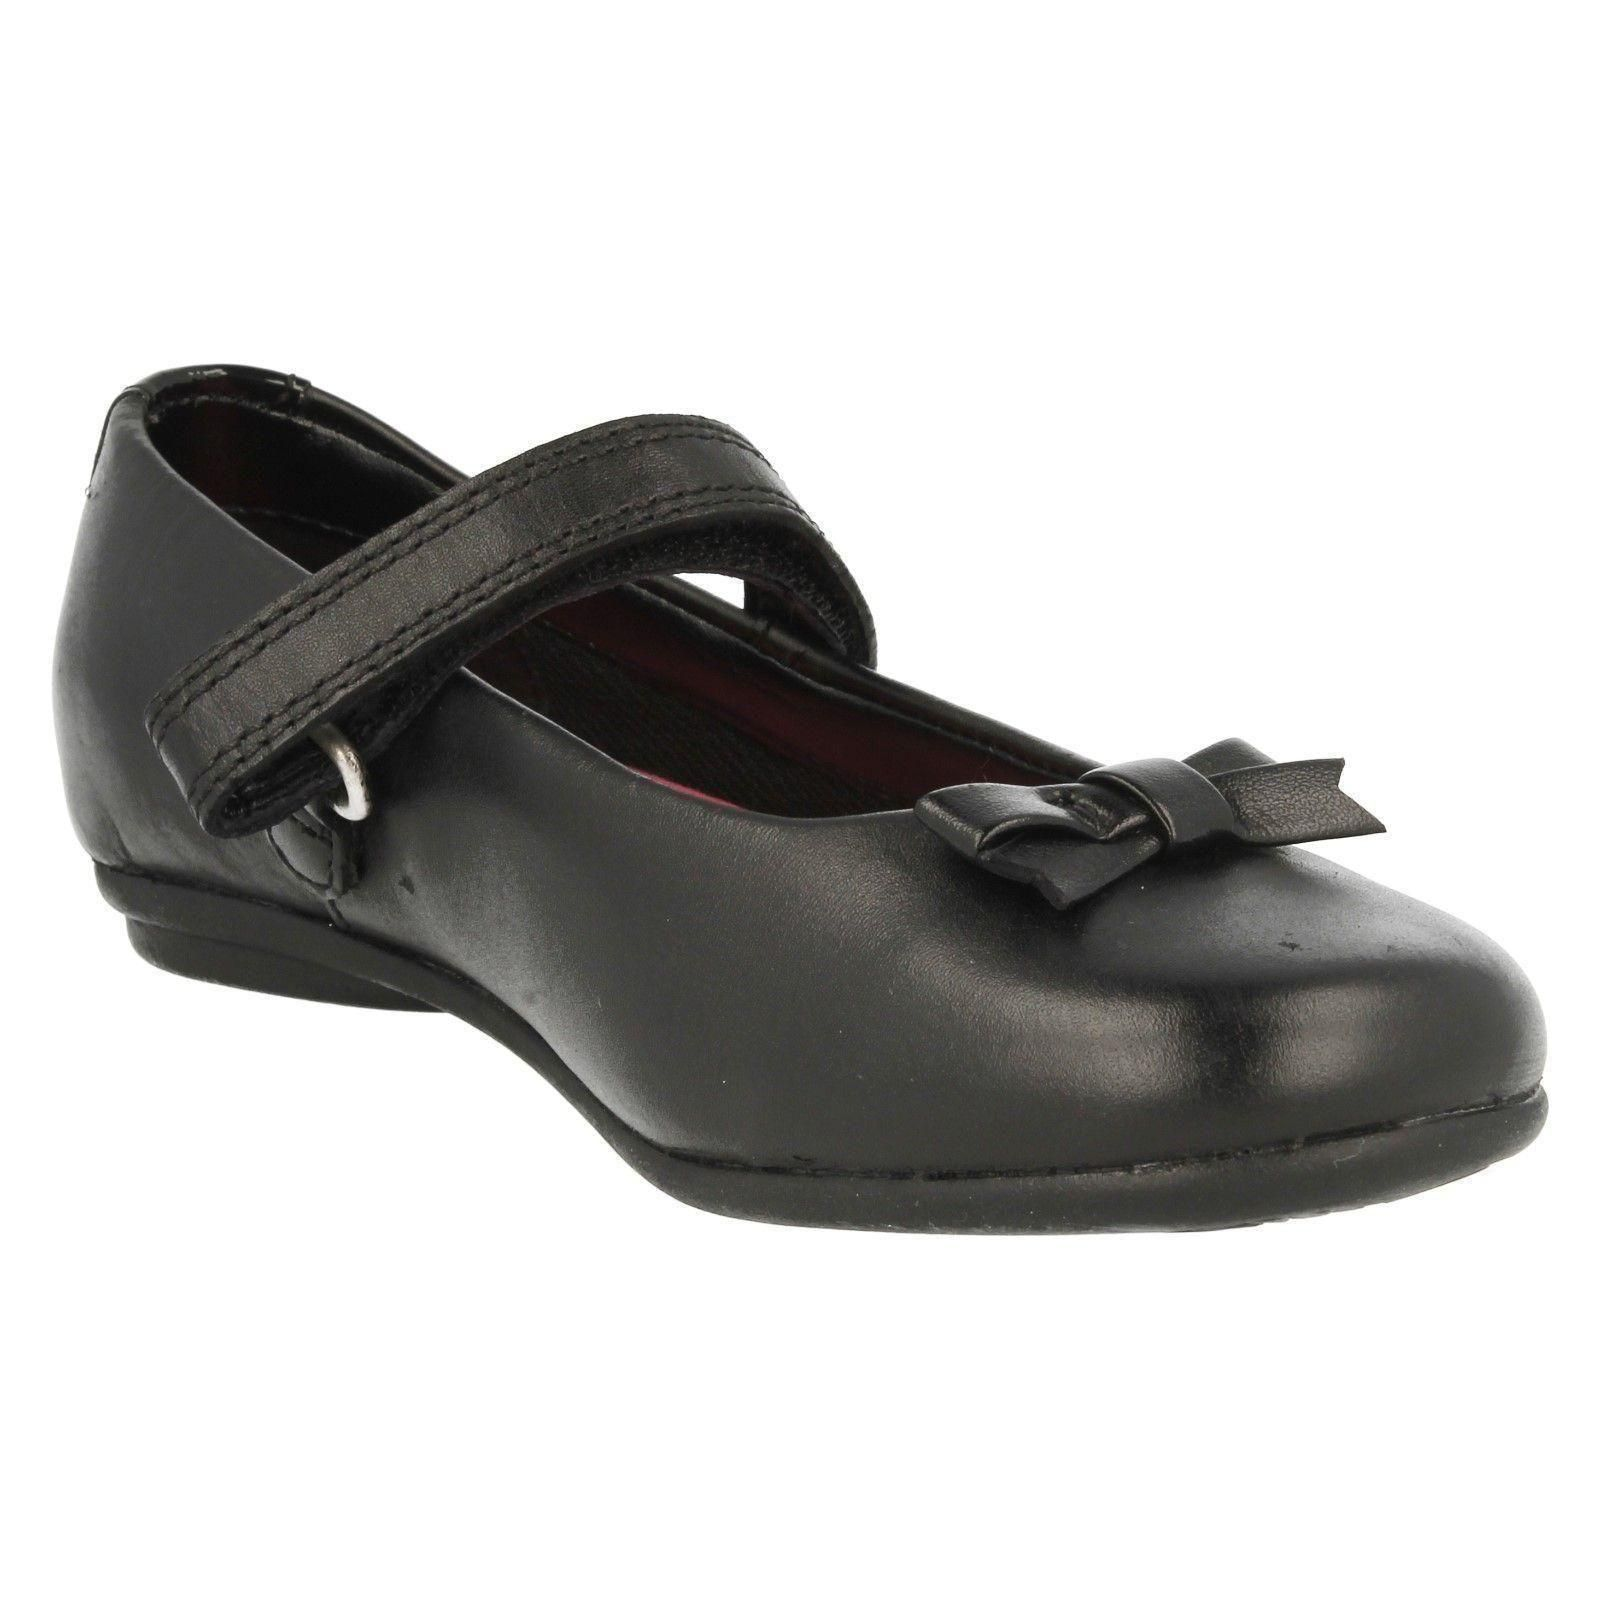 Ebay Clarks Shoes Size